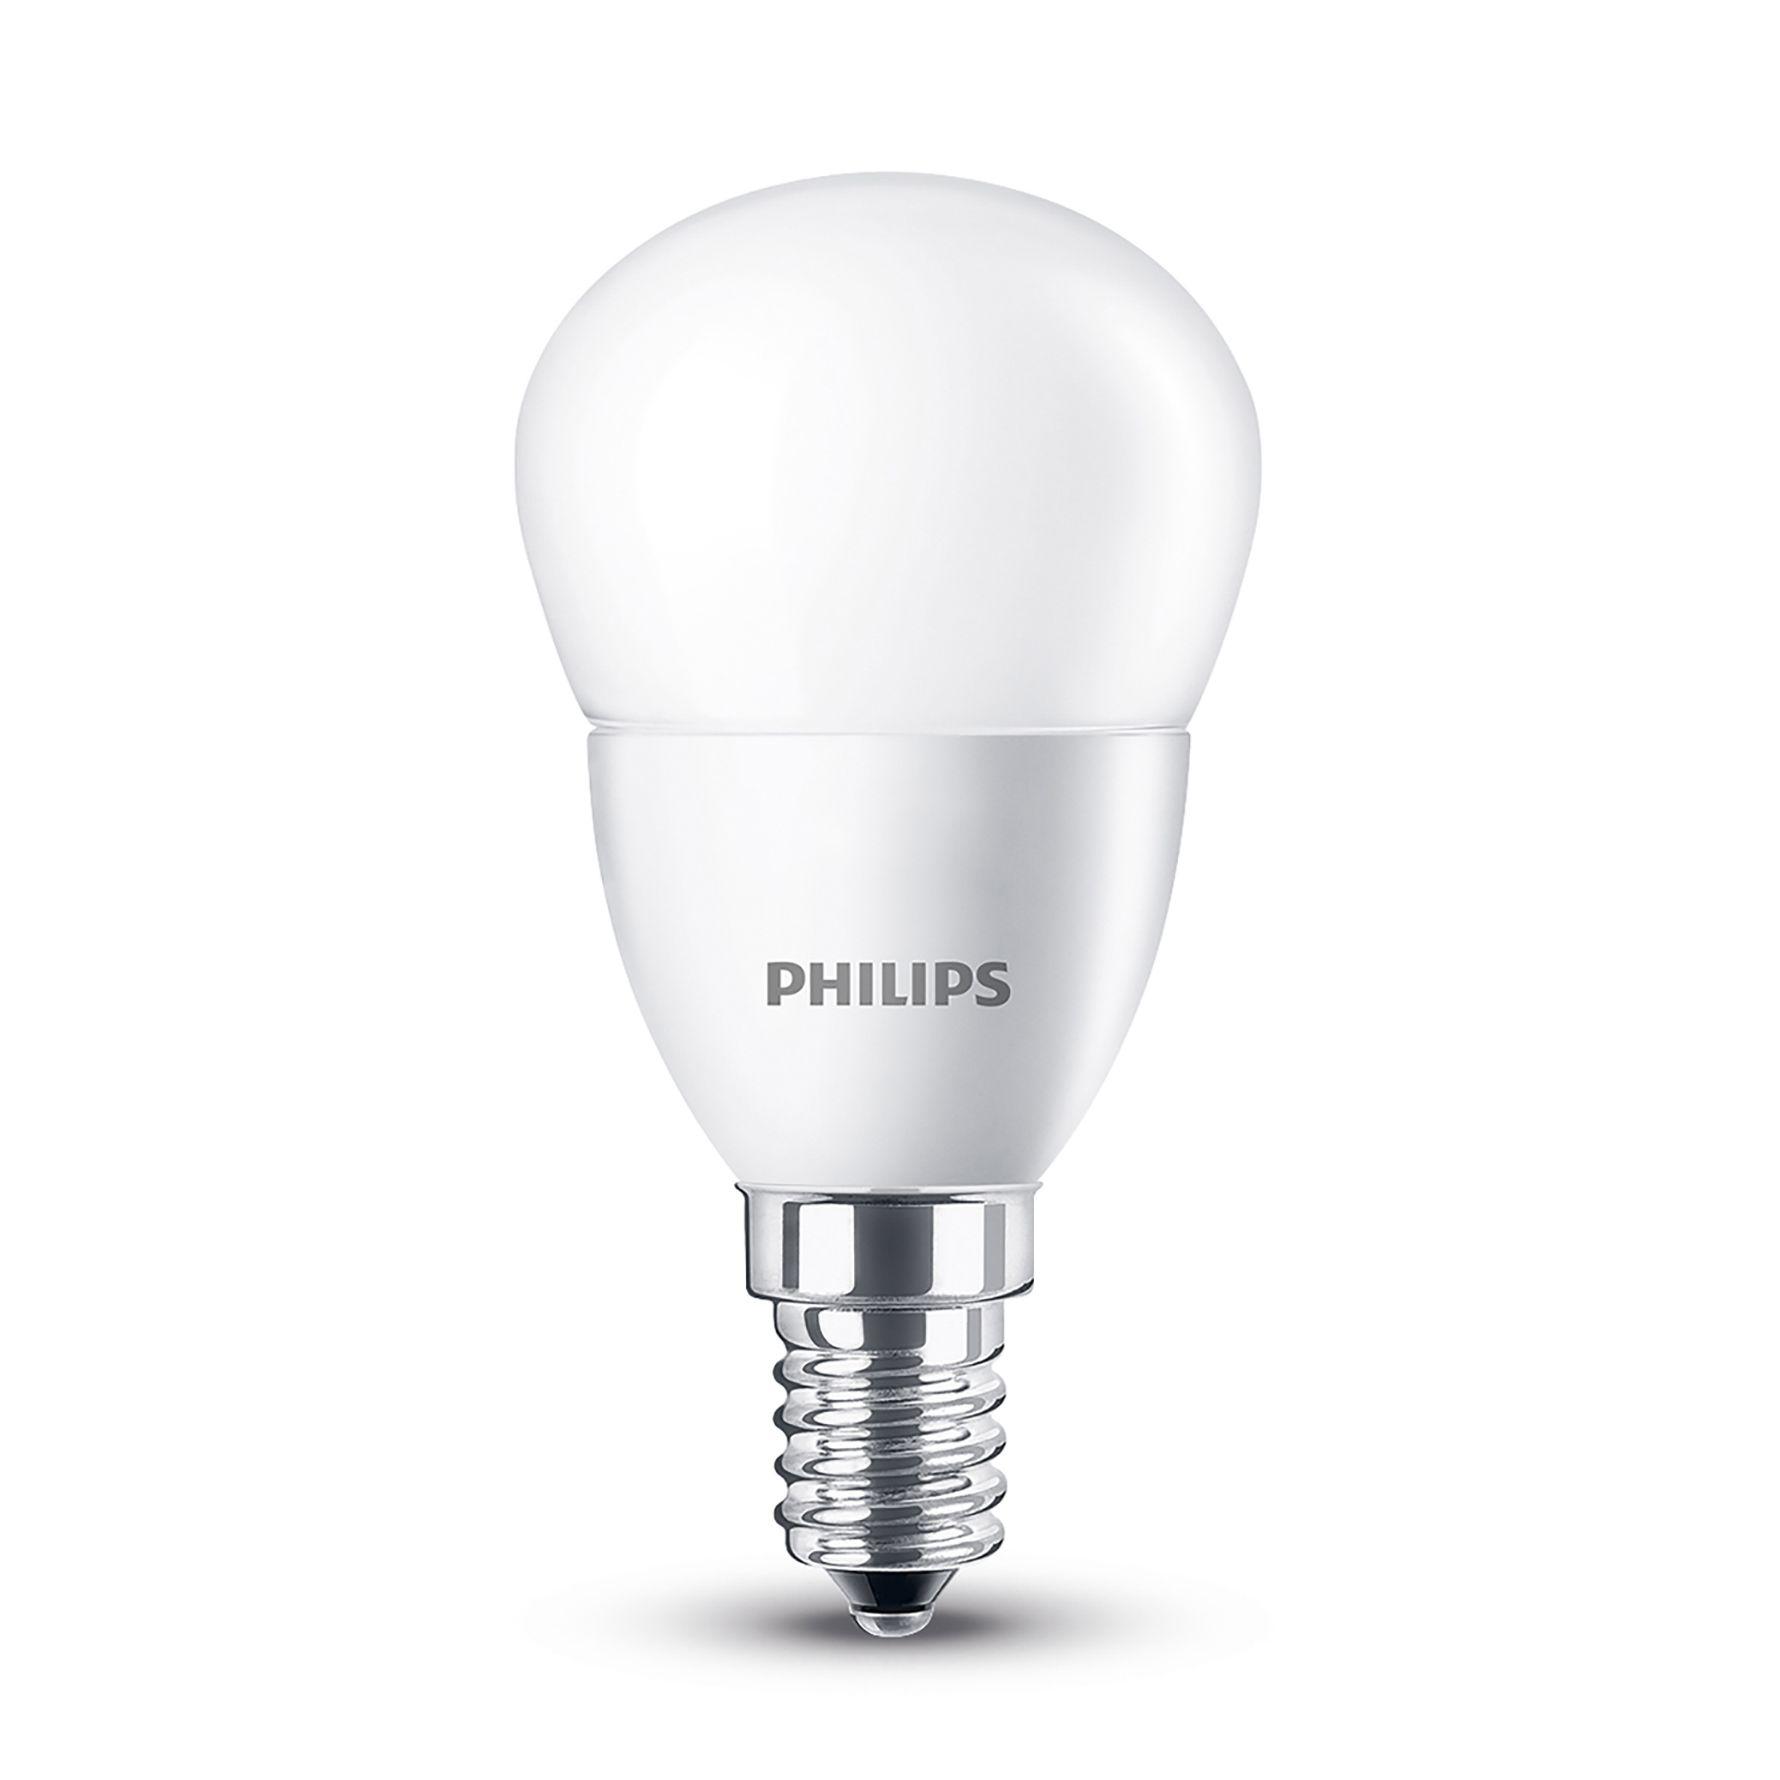 Philips E14 250lm Led Ball Light Bulb